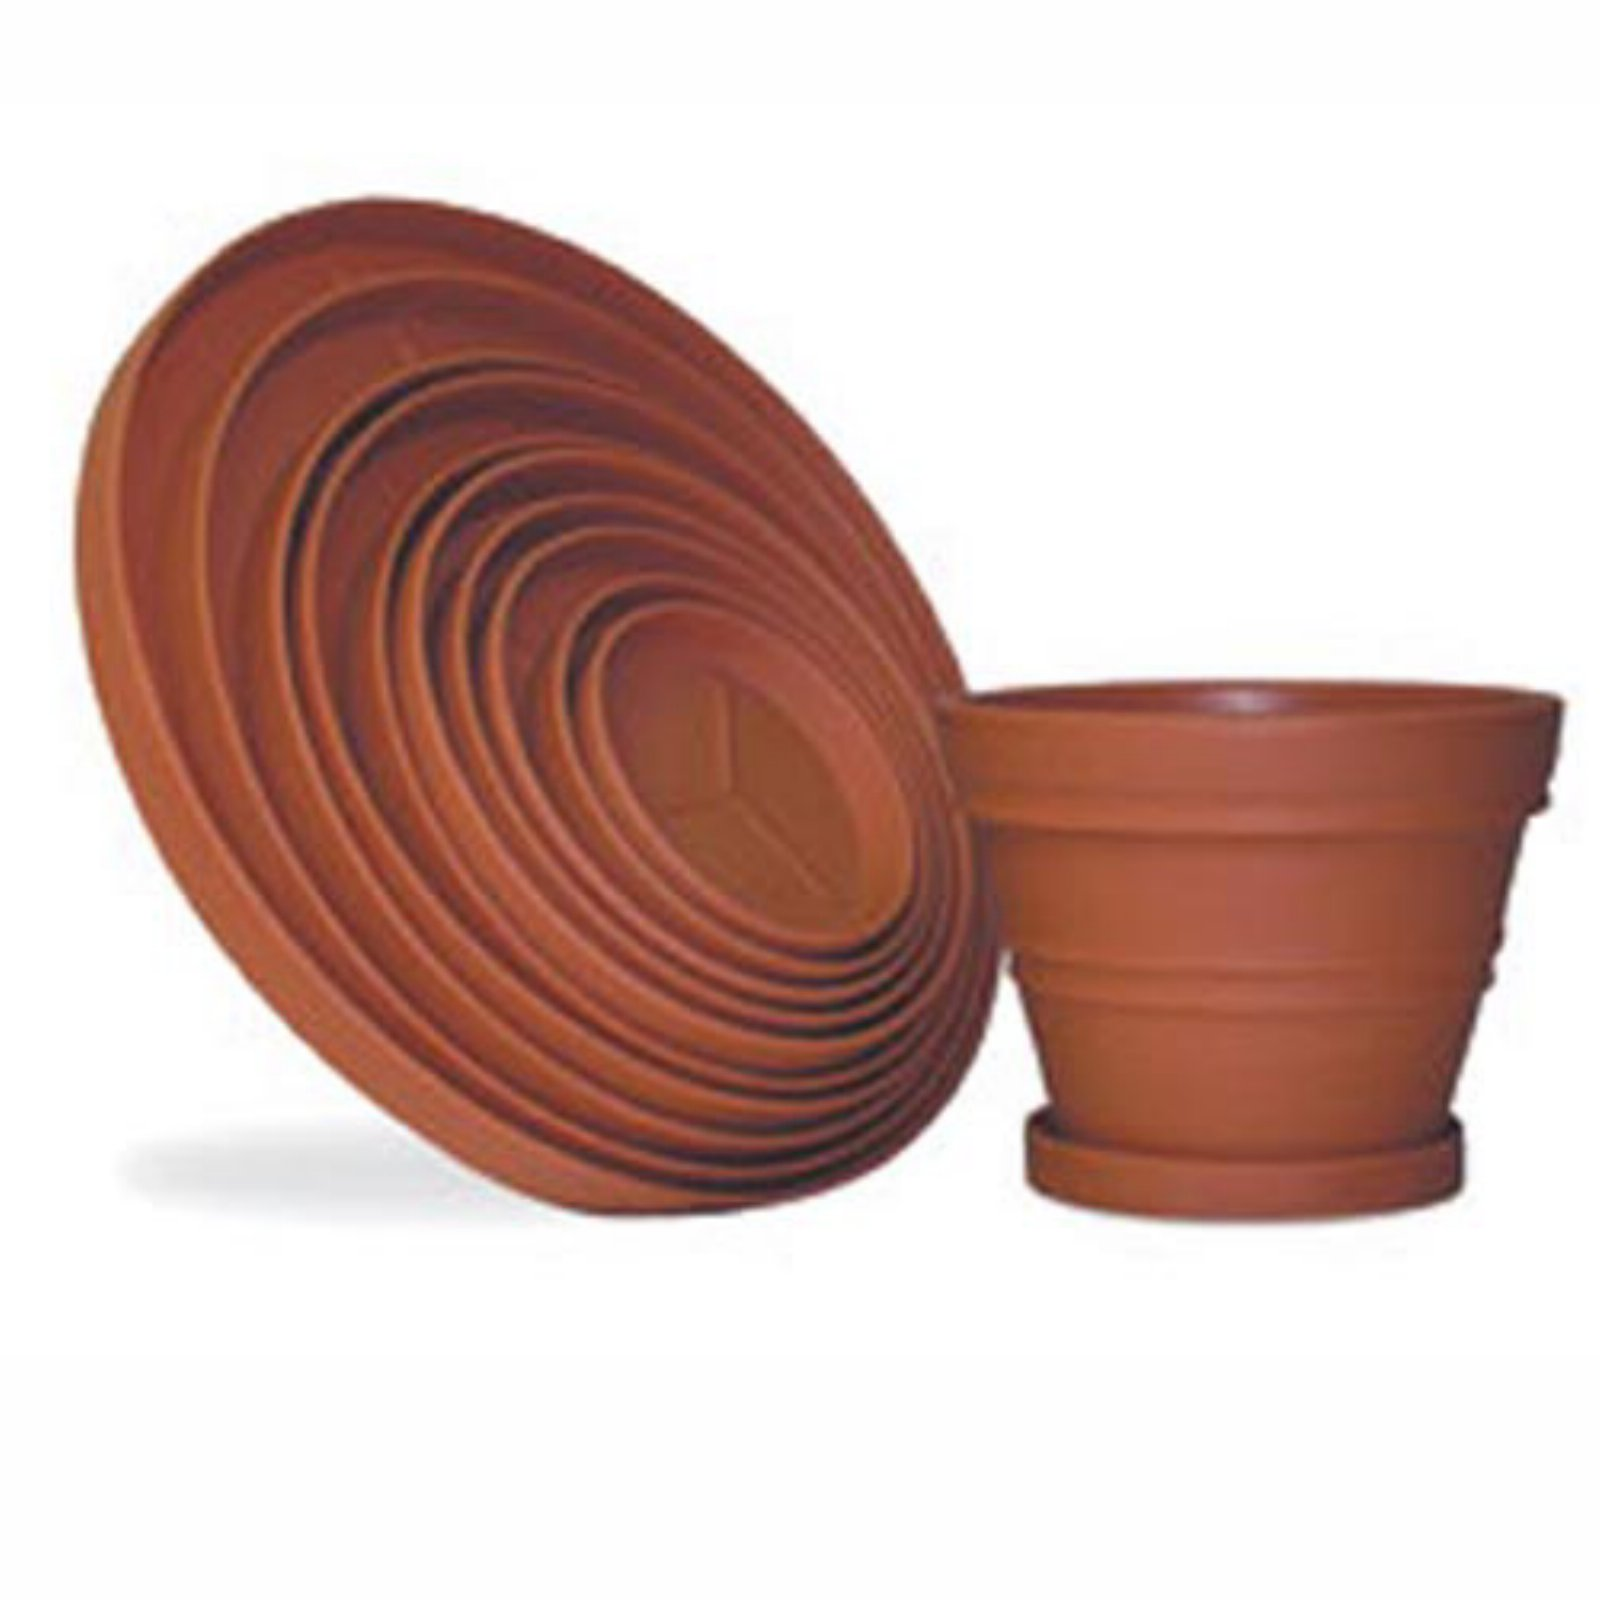 Round Resin Planter Saucers